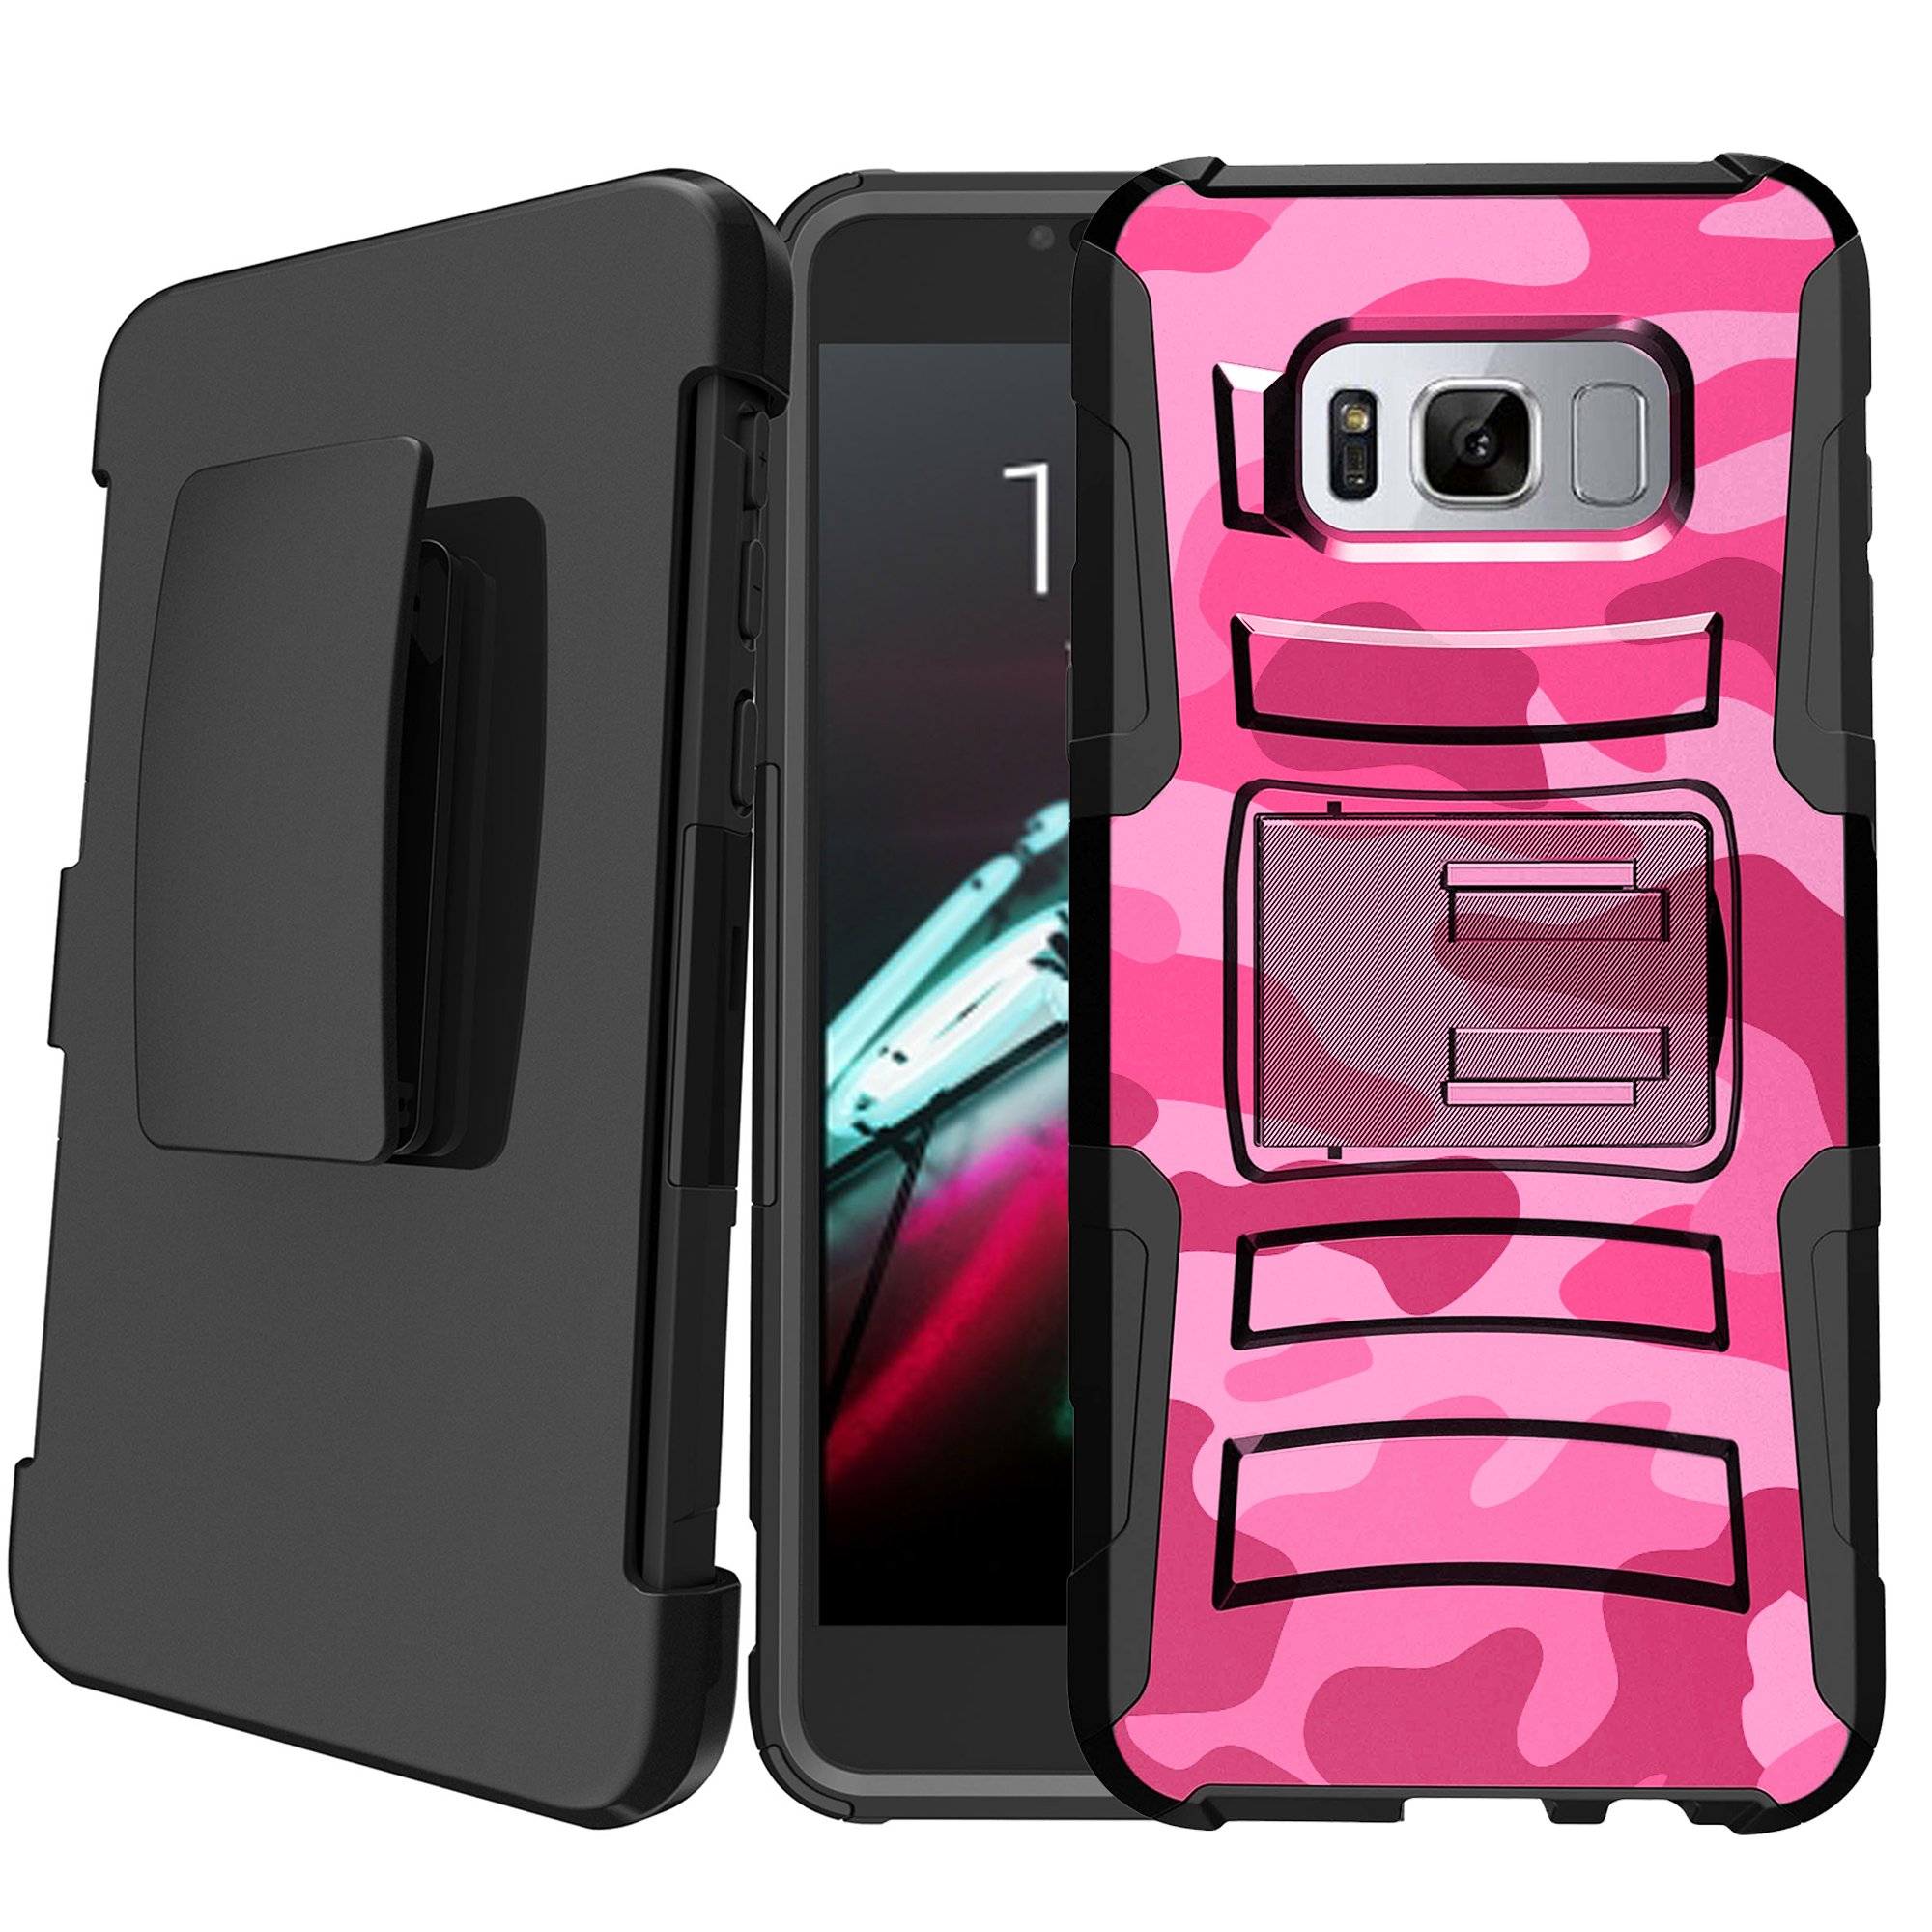 Samsung Galaxy S8 SM-G950 Holster Case [Camo Case][Camouflage Phone Case Series] w/ Built-In Kickstand + Bonus Holster - Plain Black /No Design